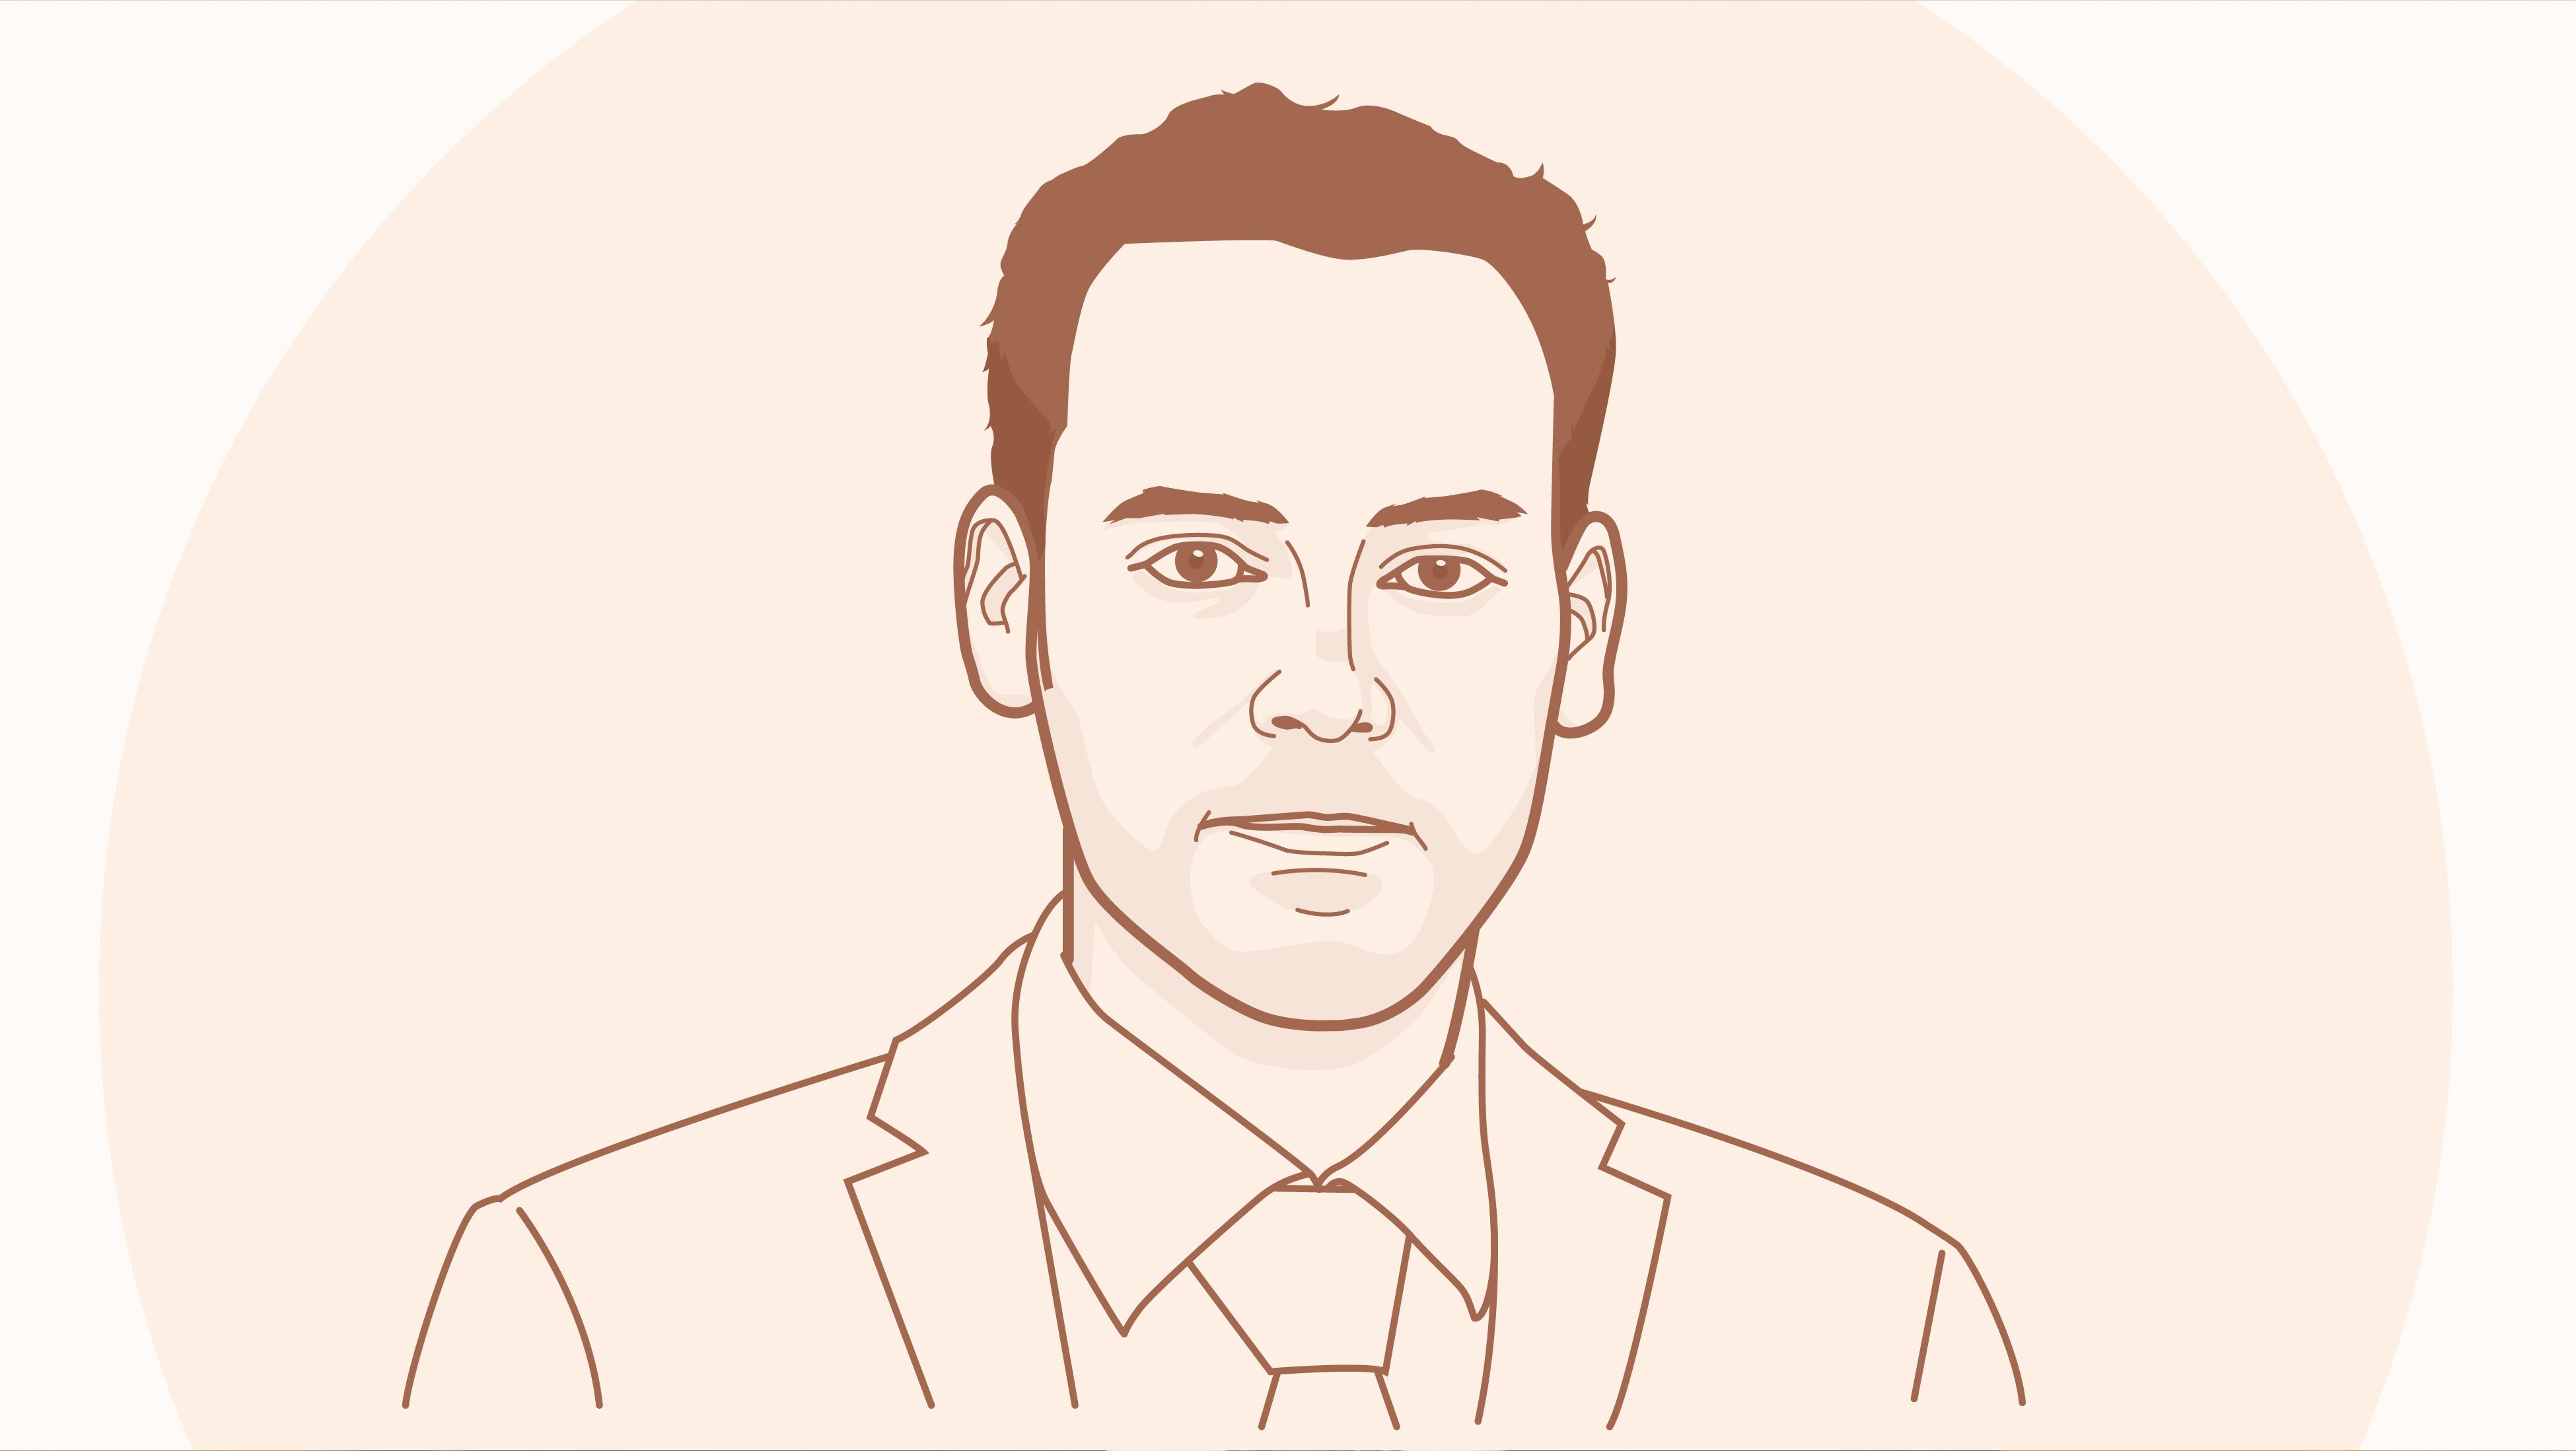 Alberto Gómez, Spain's blockchain evangelist